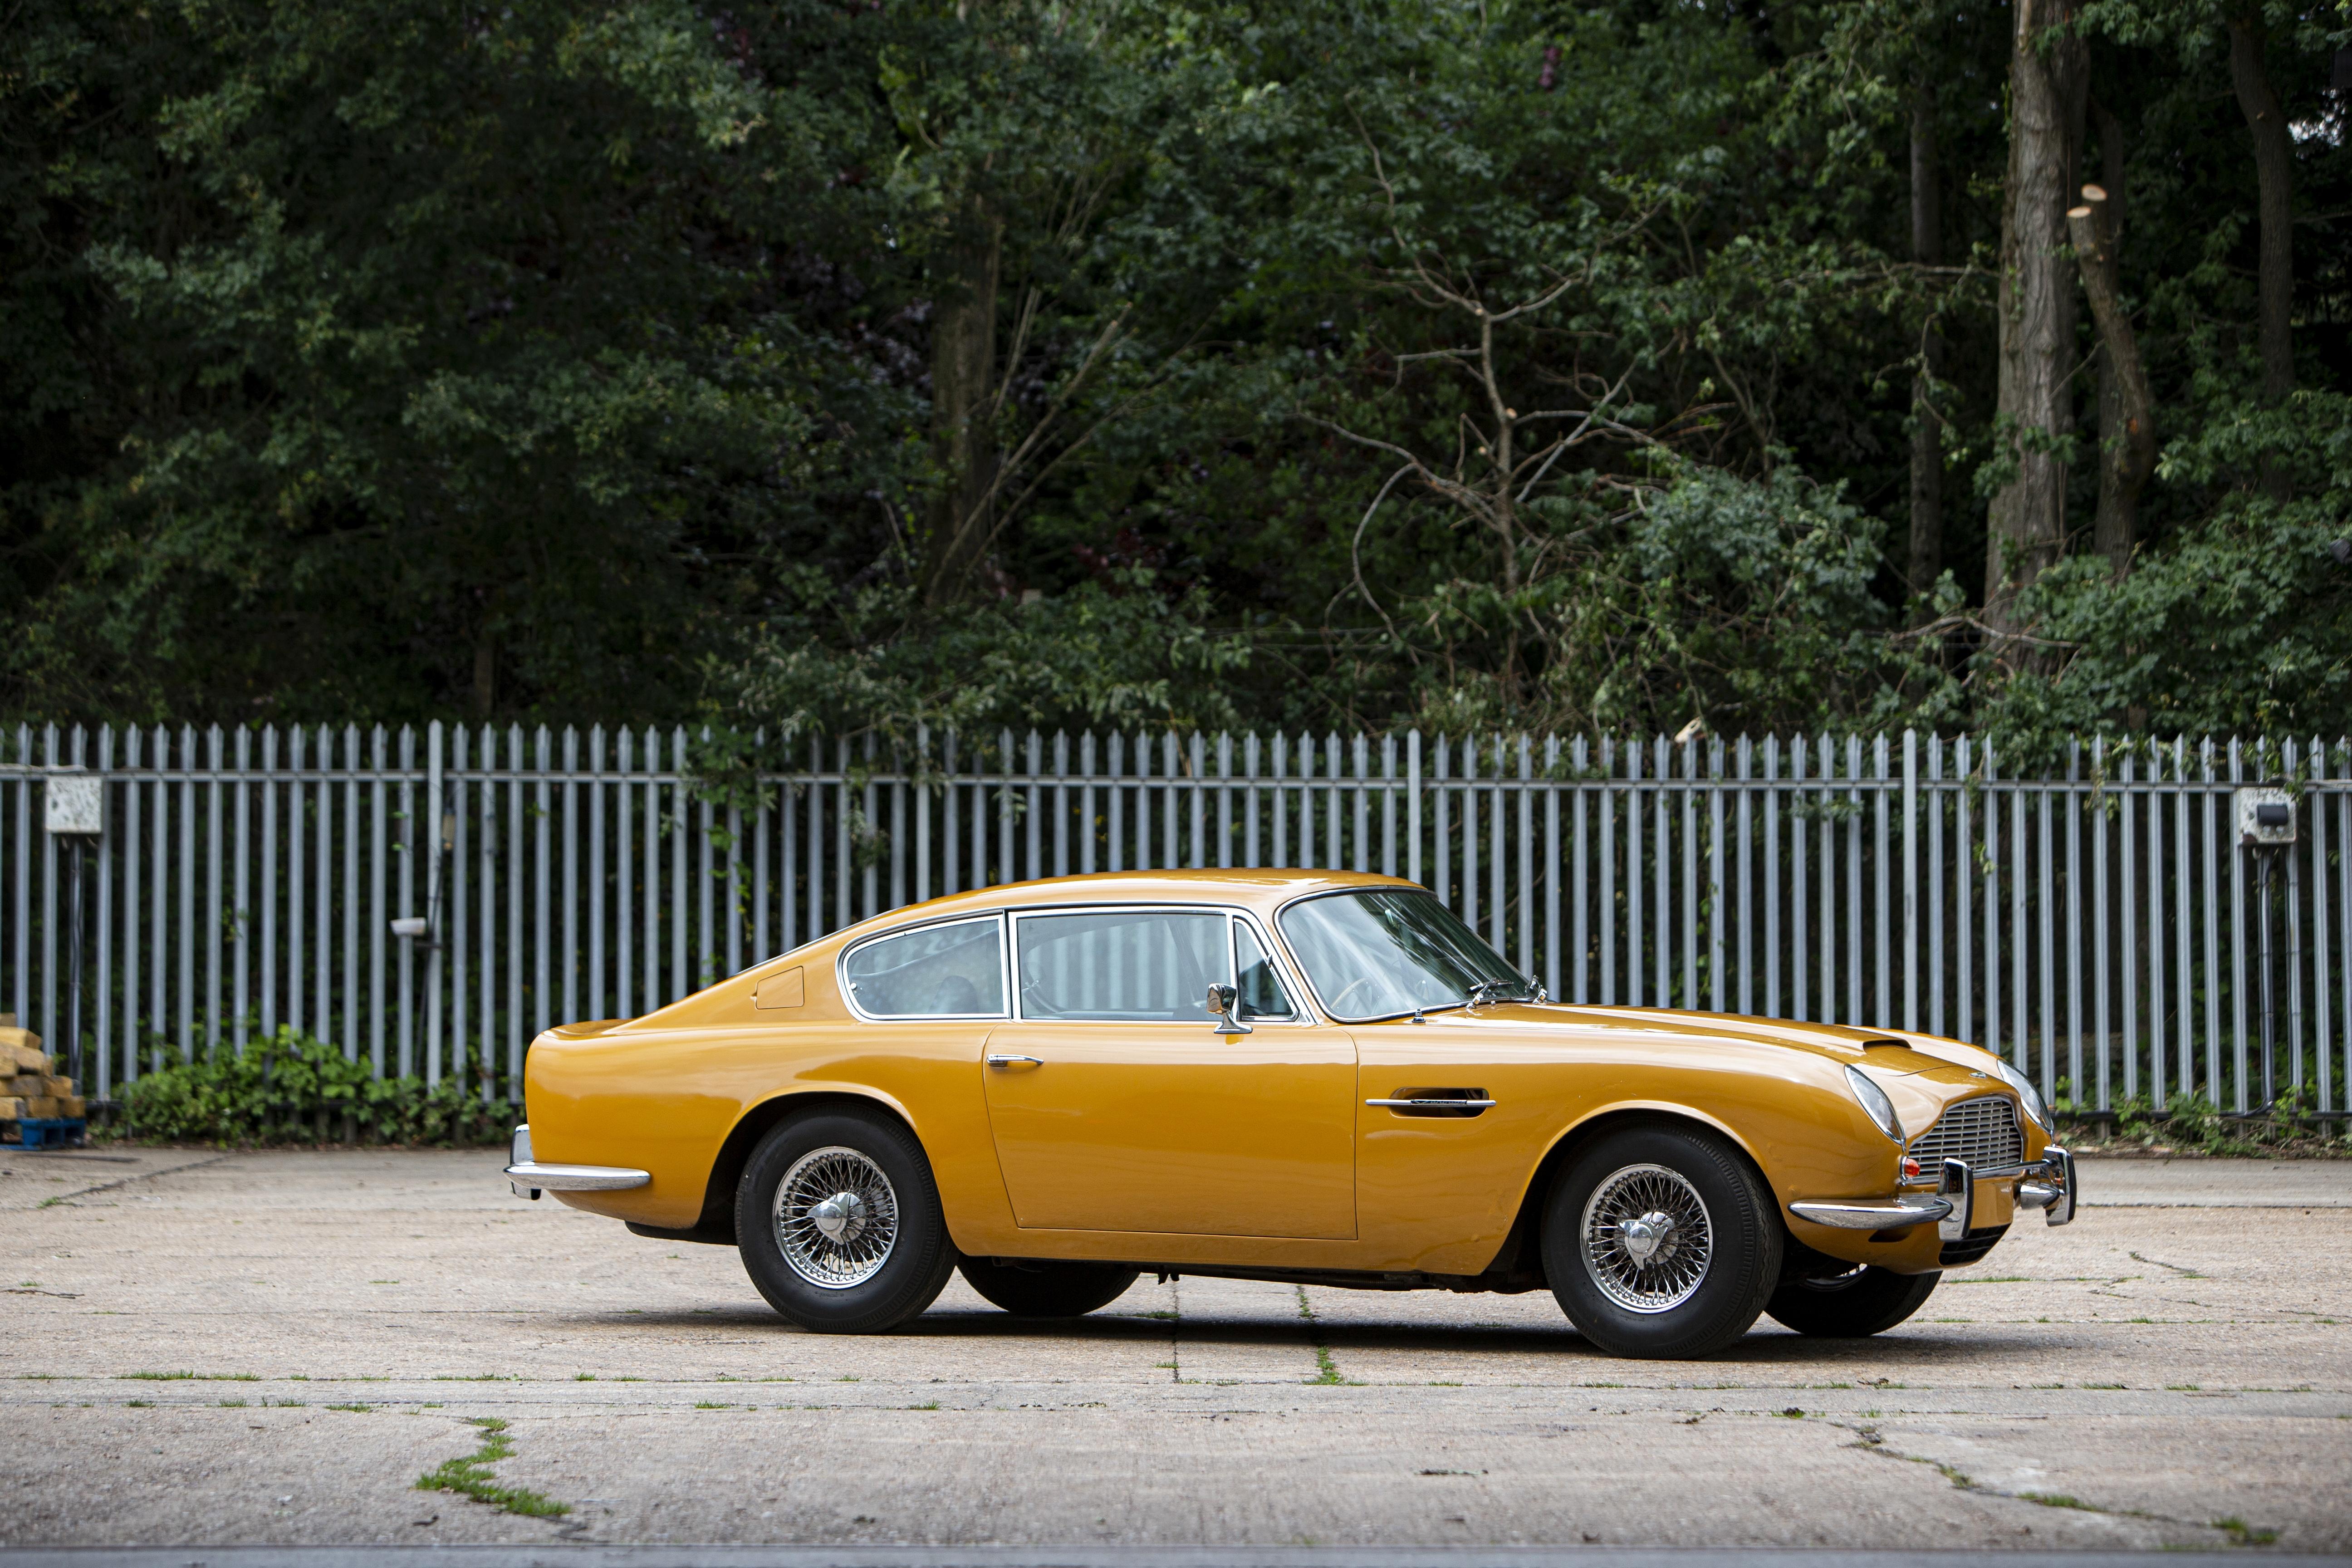 1970 Aston Martin DB6 Mk2 Sports Saloon Chassis no. DB6MK2FI/4134/R